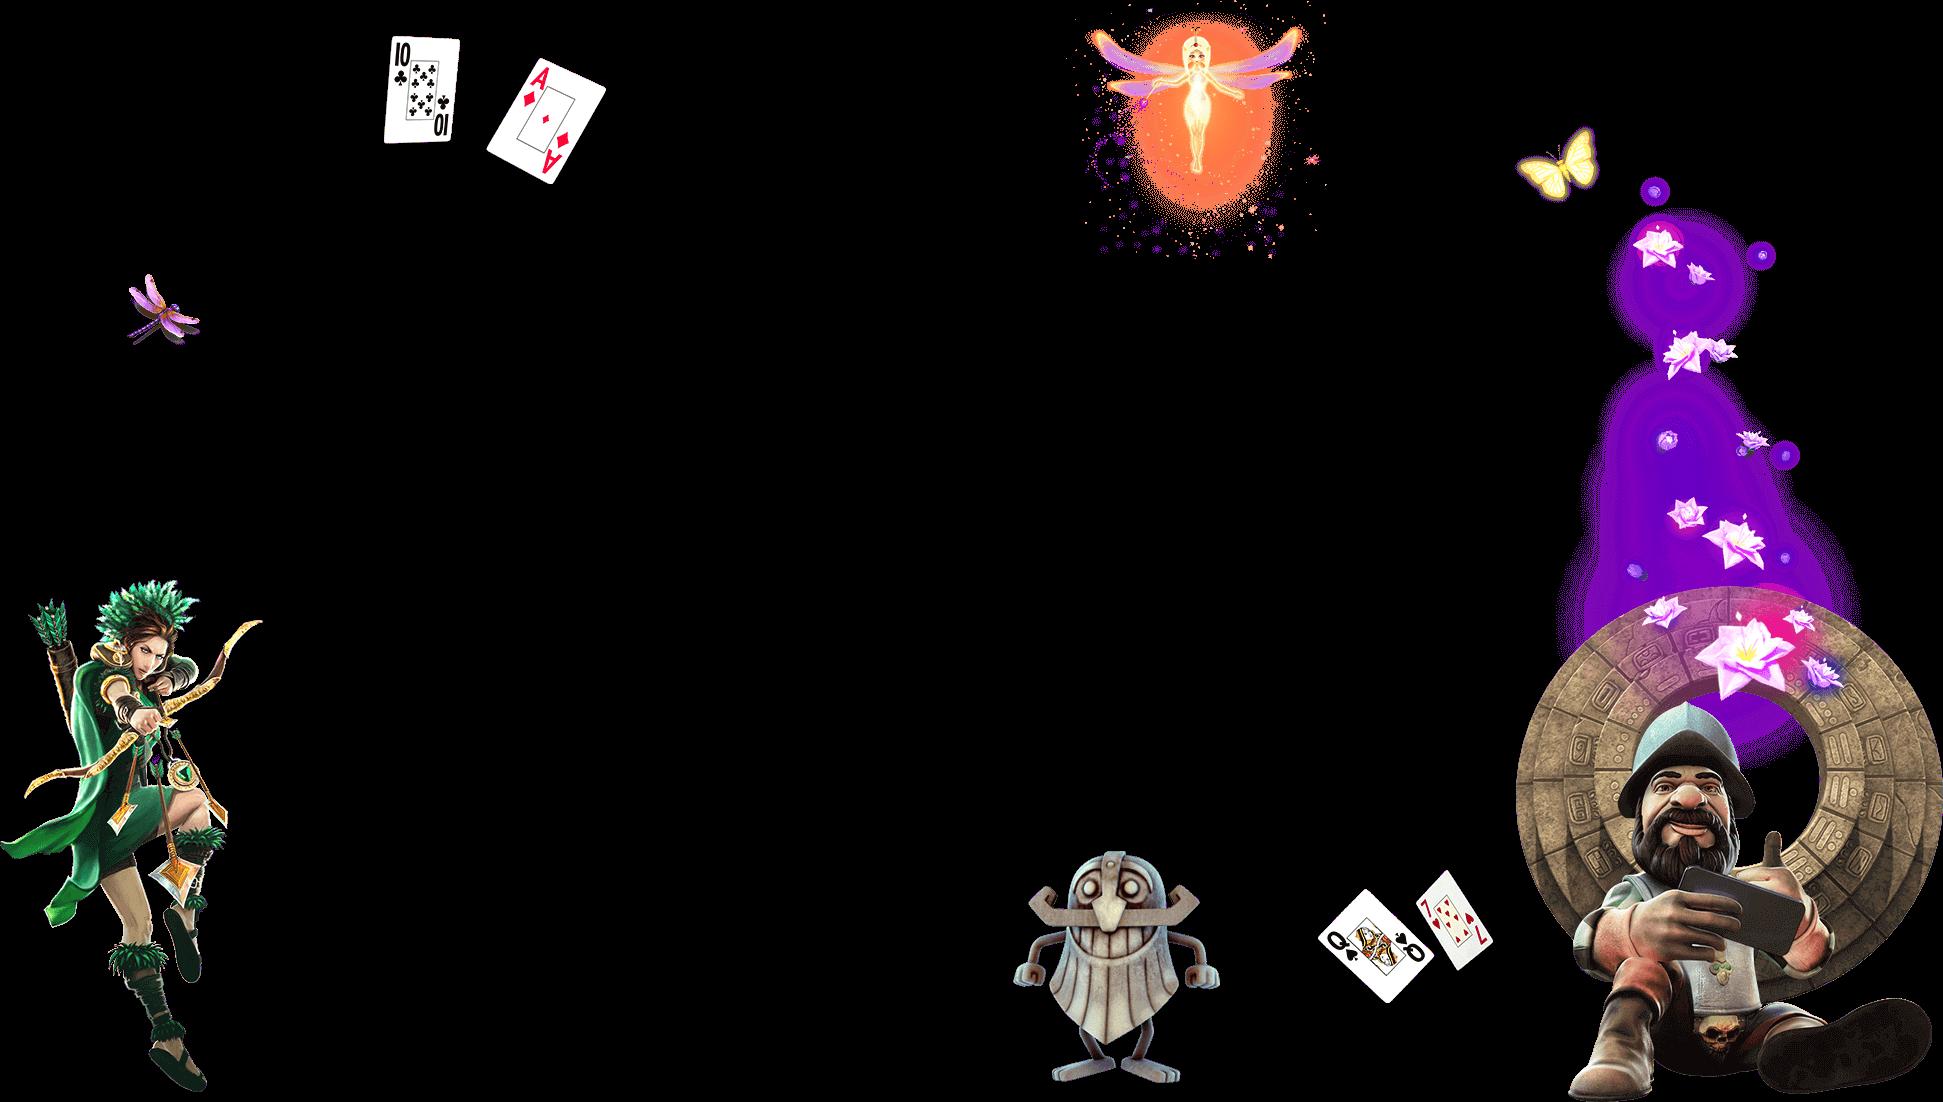 Worms casino Brazil playtech 19937